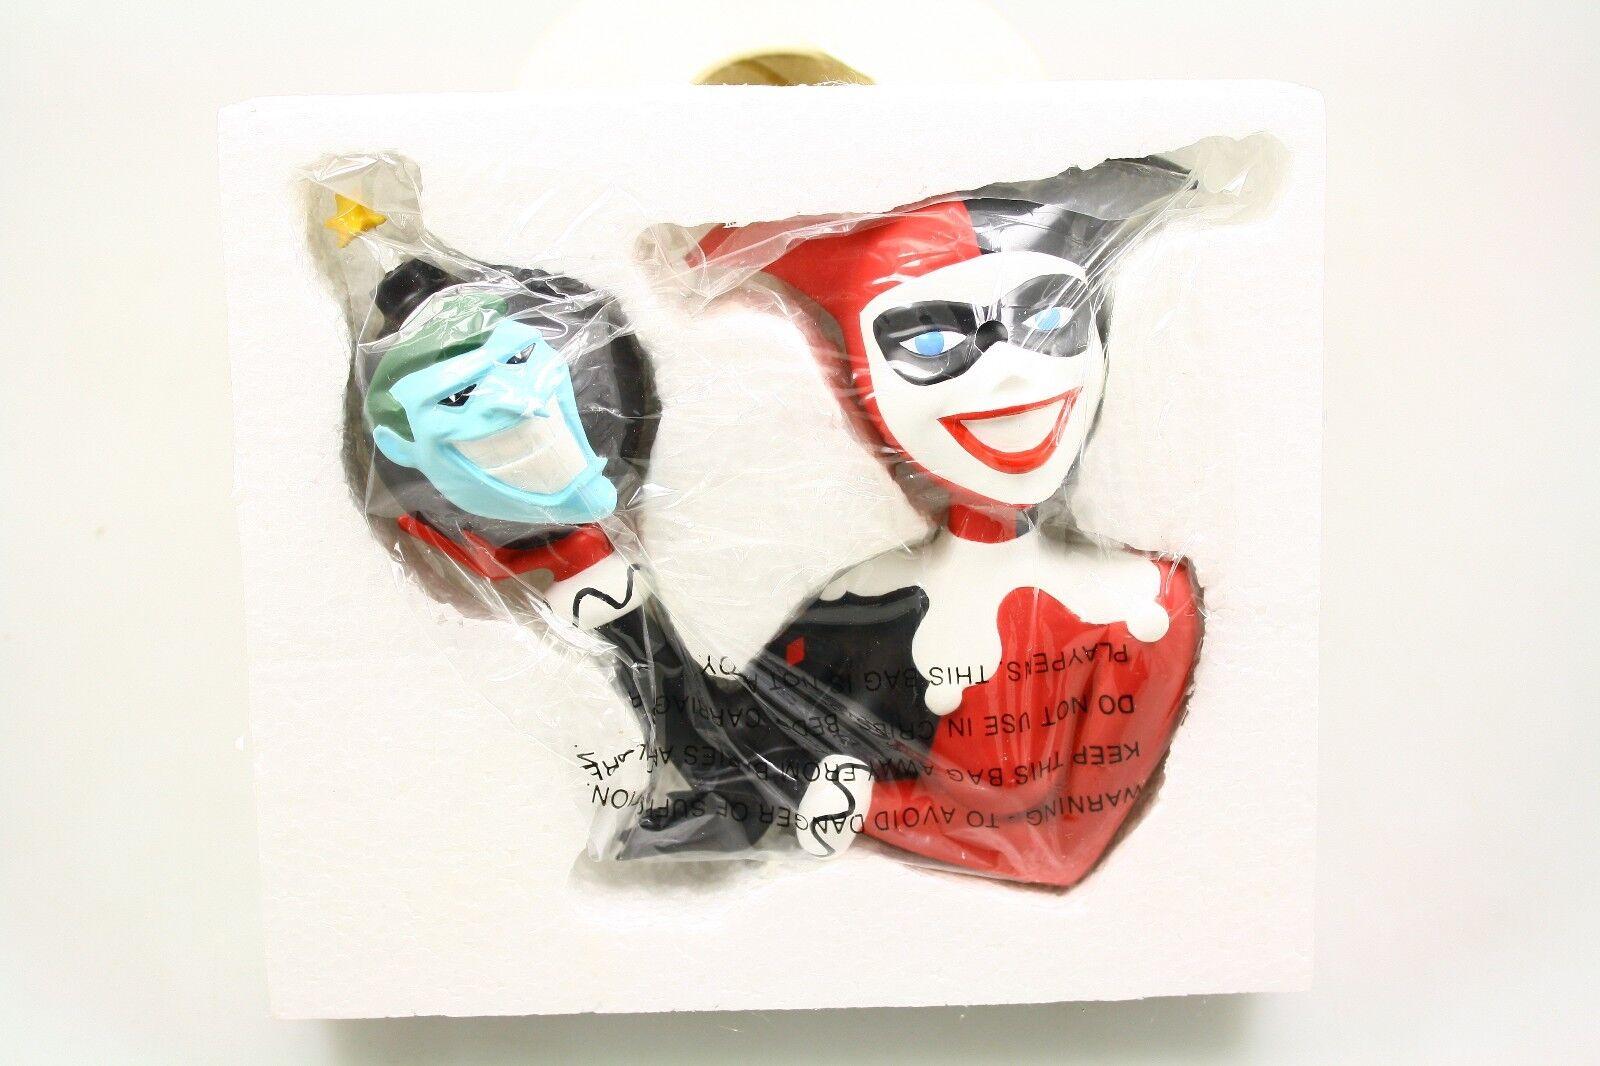 DC universo colección Harley Quinn Escultura De Parojo De Edición Limitada